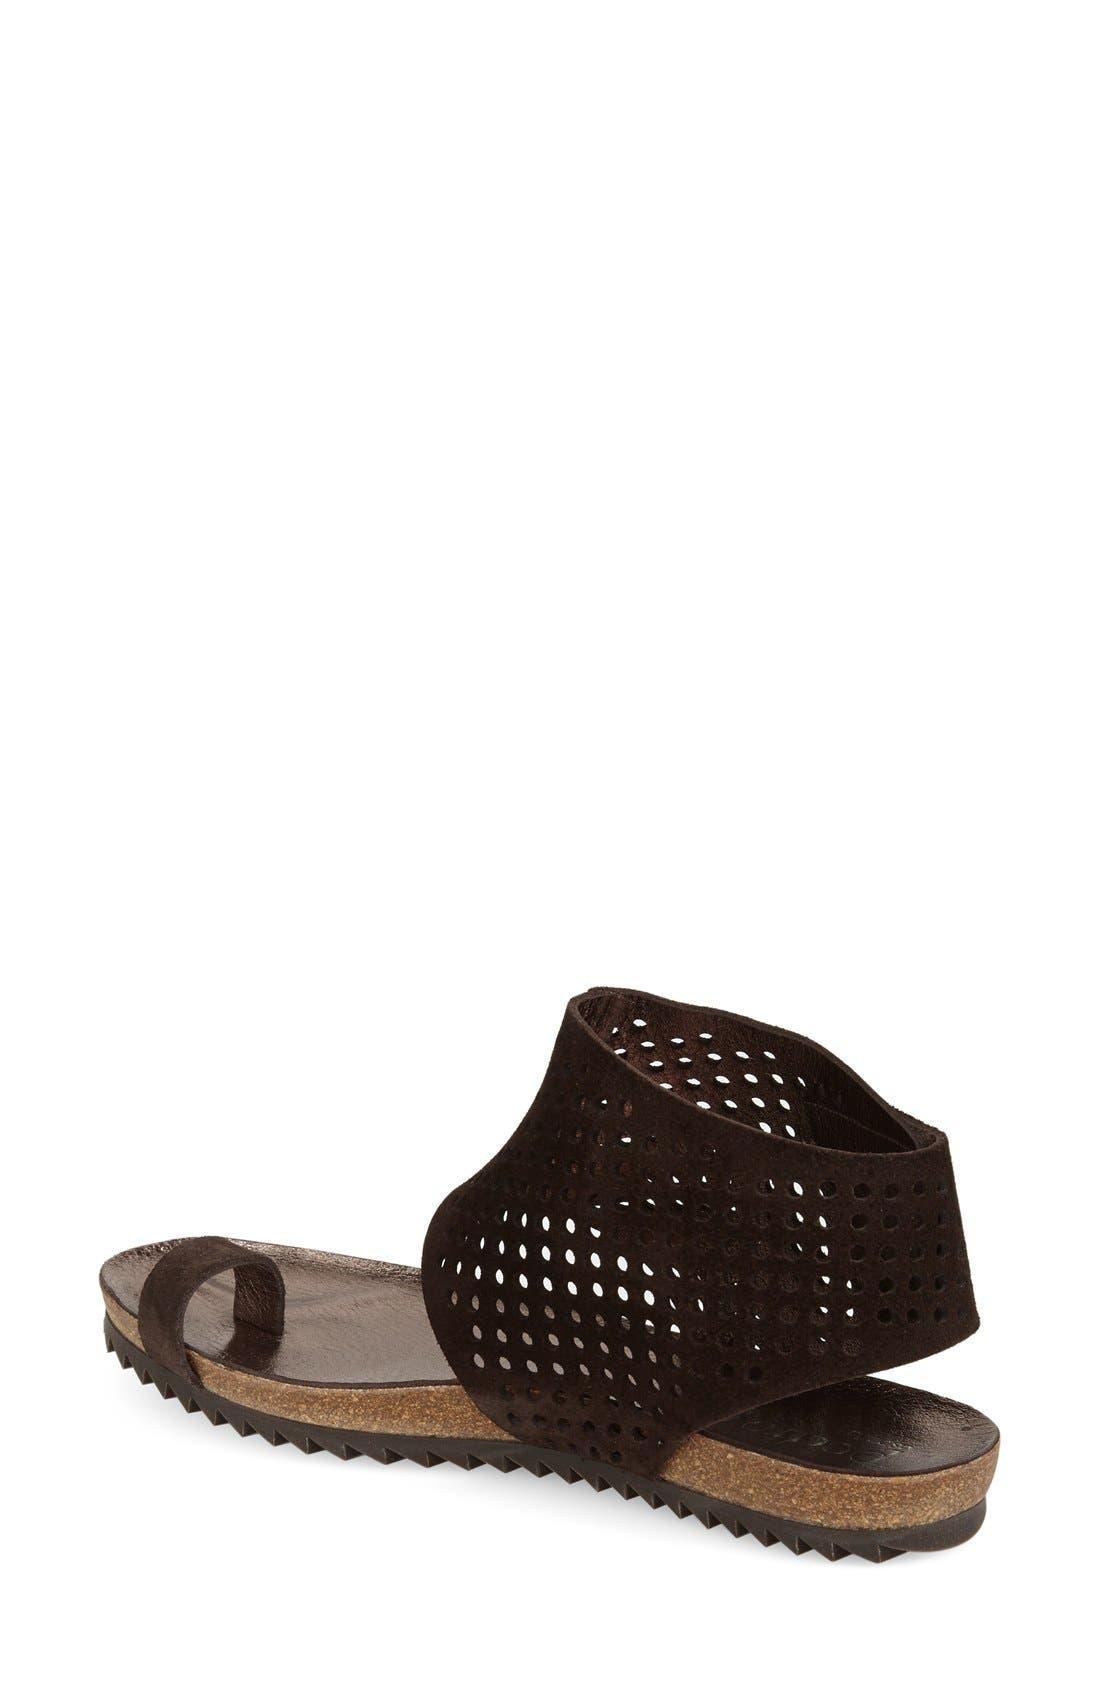 Alternate Image 2  - Pedro Garcia Perforated Ankle Cuff Sandal (Women)